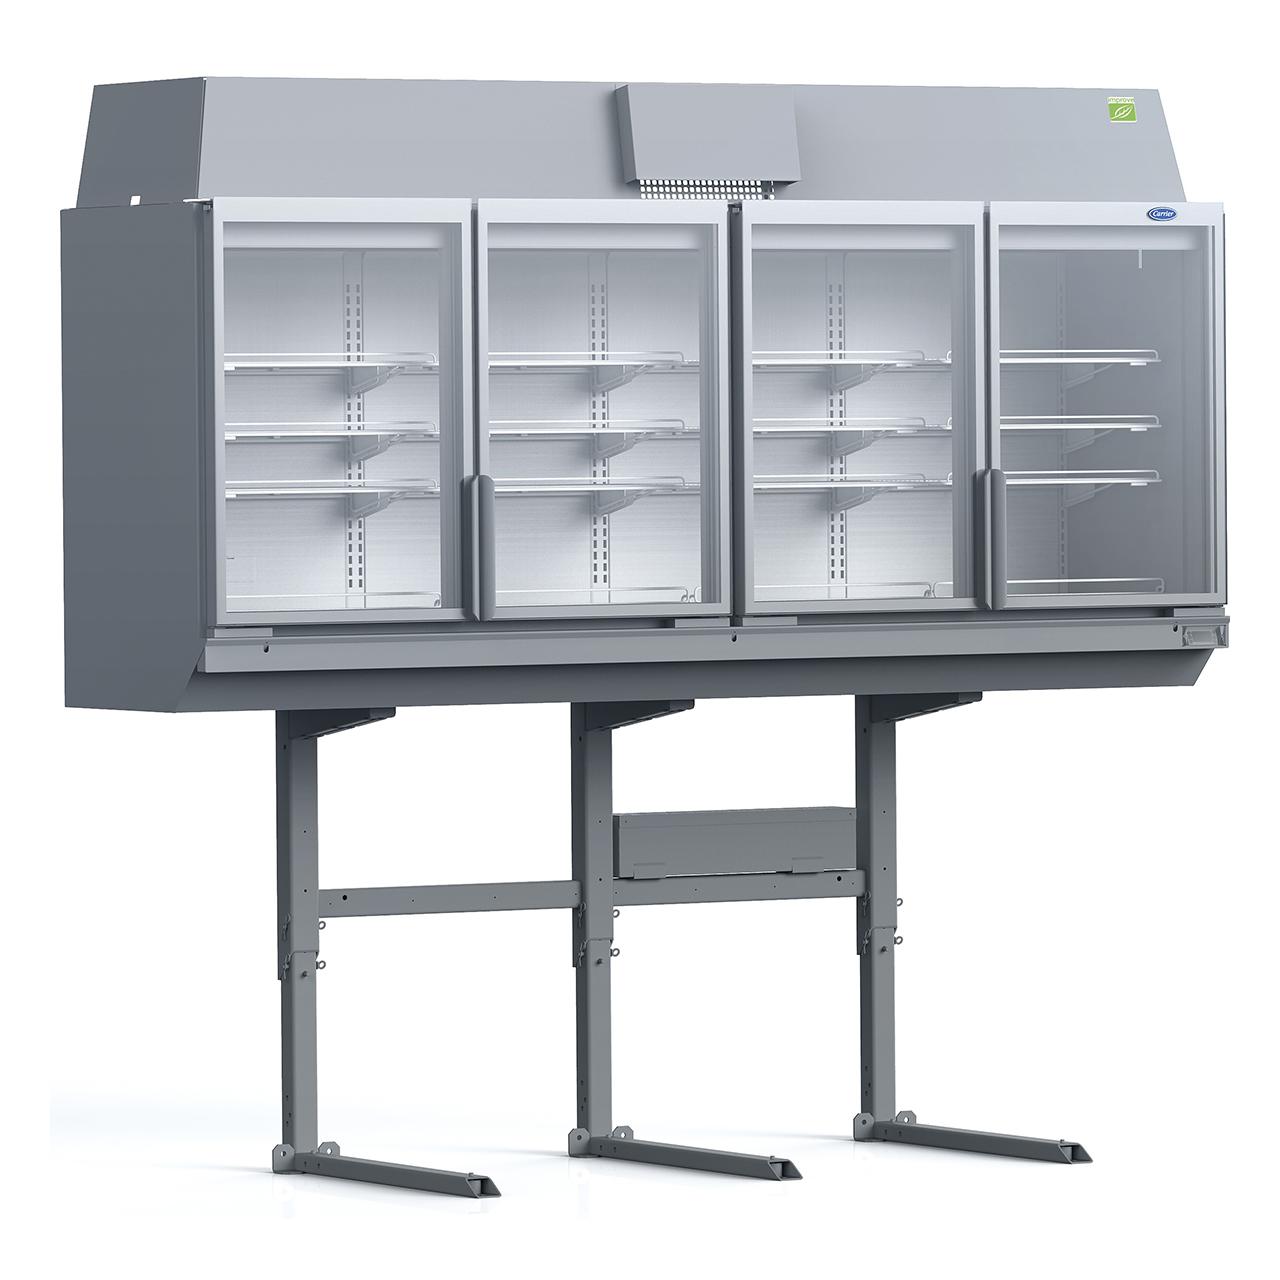 vertical-freezer-top-freezer-A